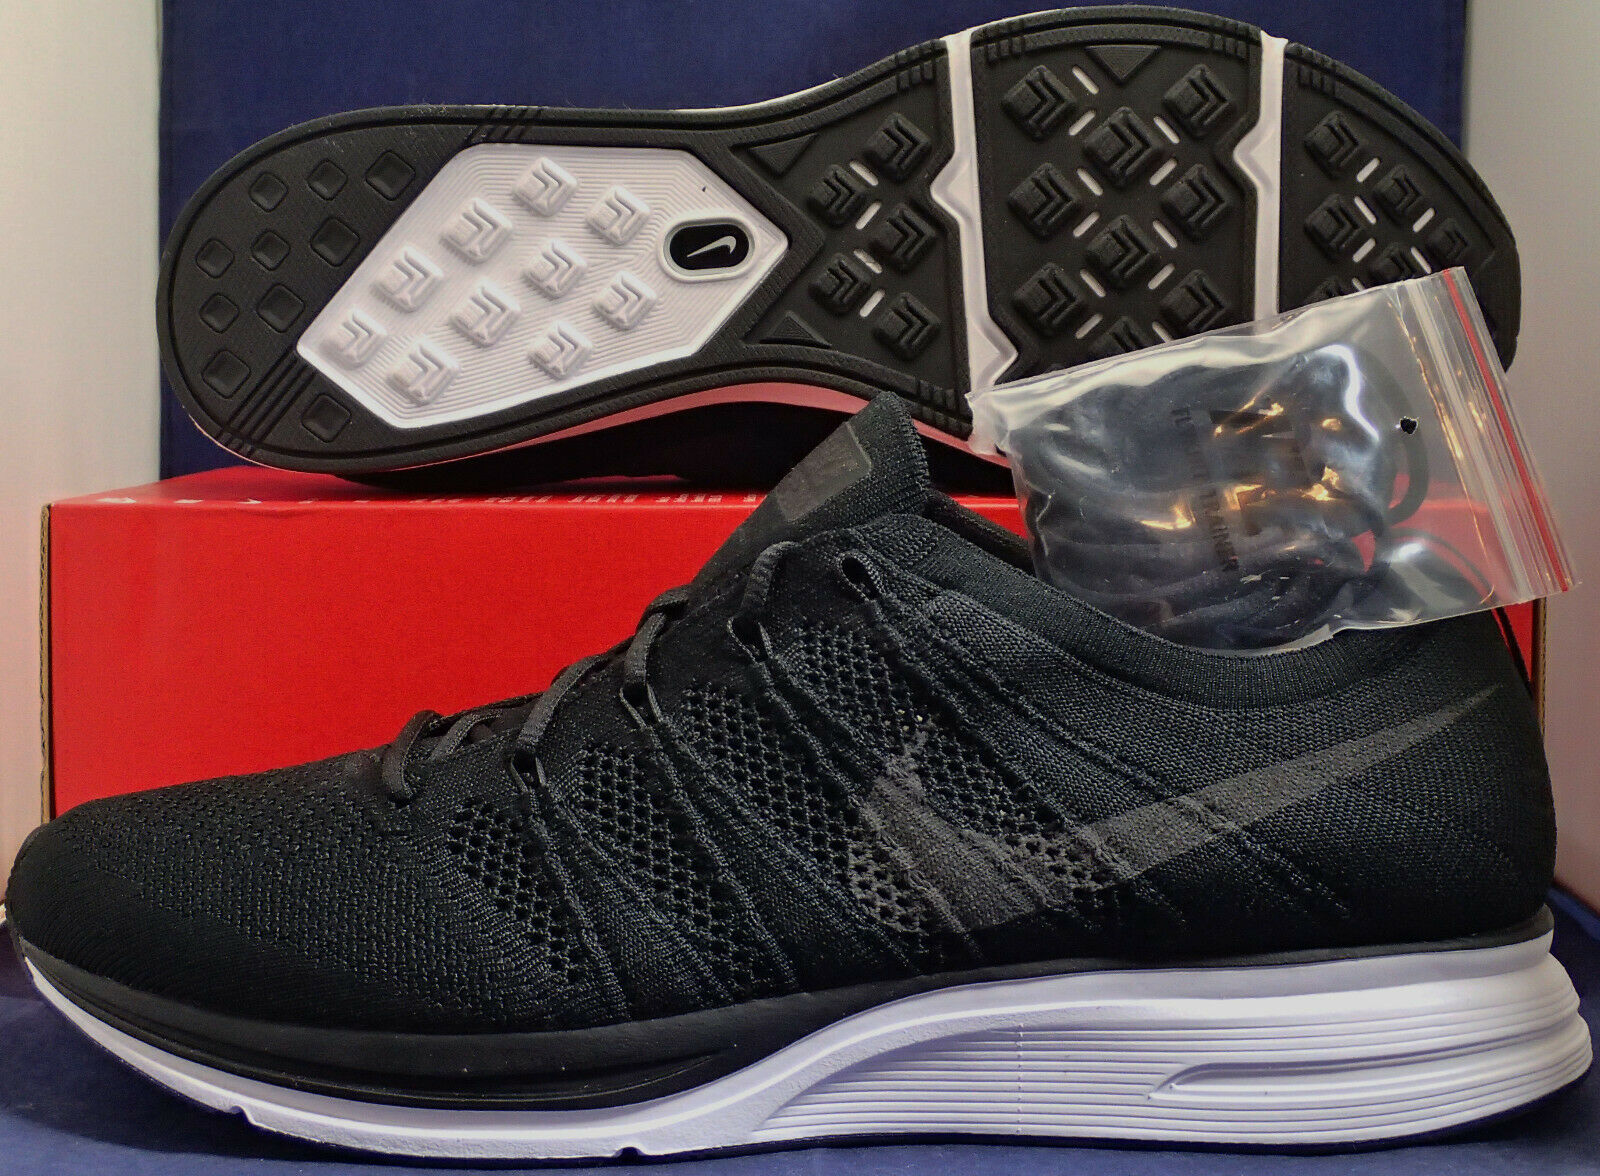 Nike Flyknit Trainer Schwarz Weiß Sz 11.5 (AH8396-007)